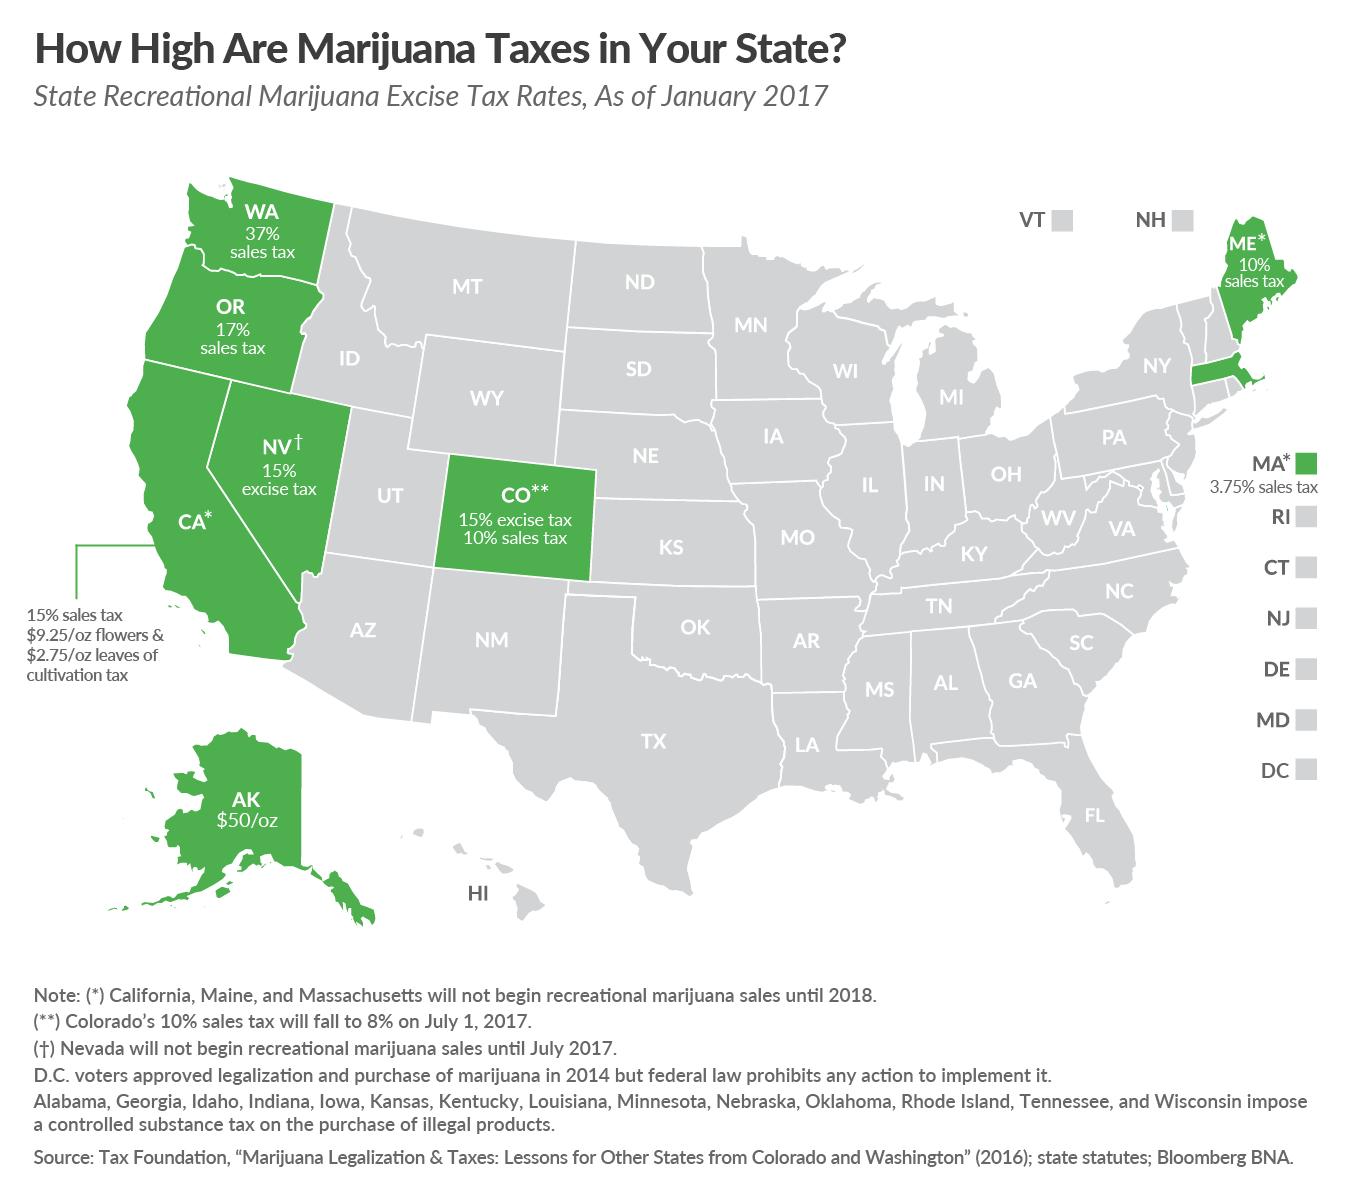 Recreational Marijuana Taxation In Your State